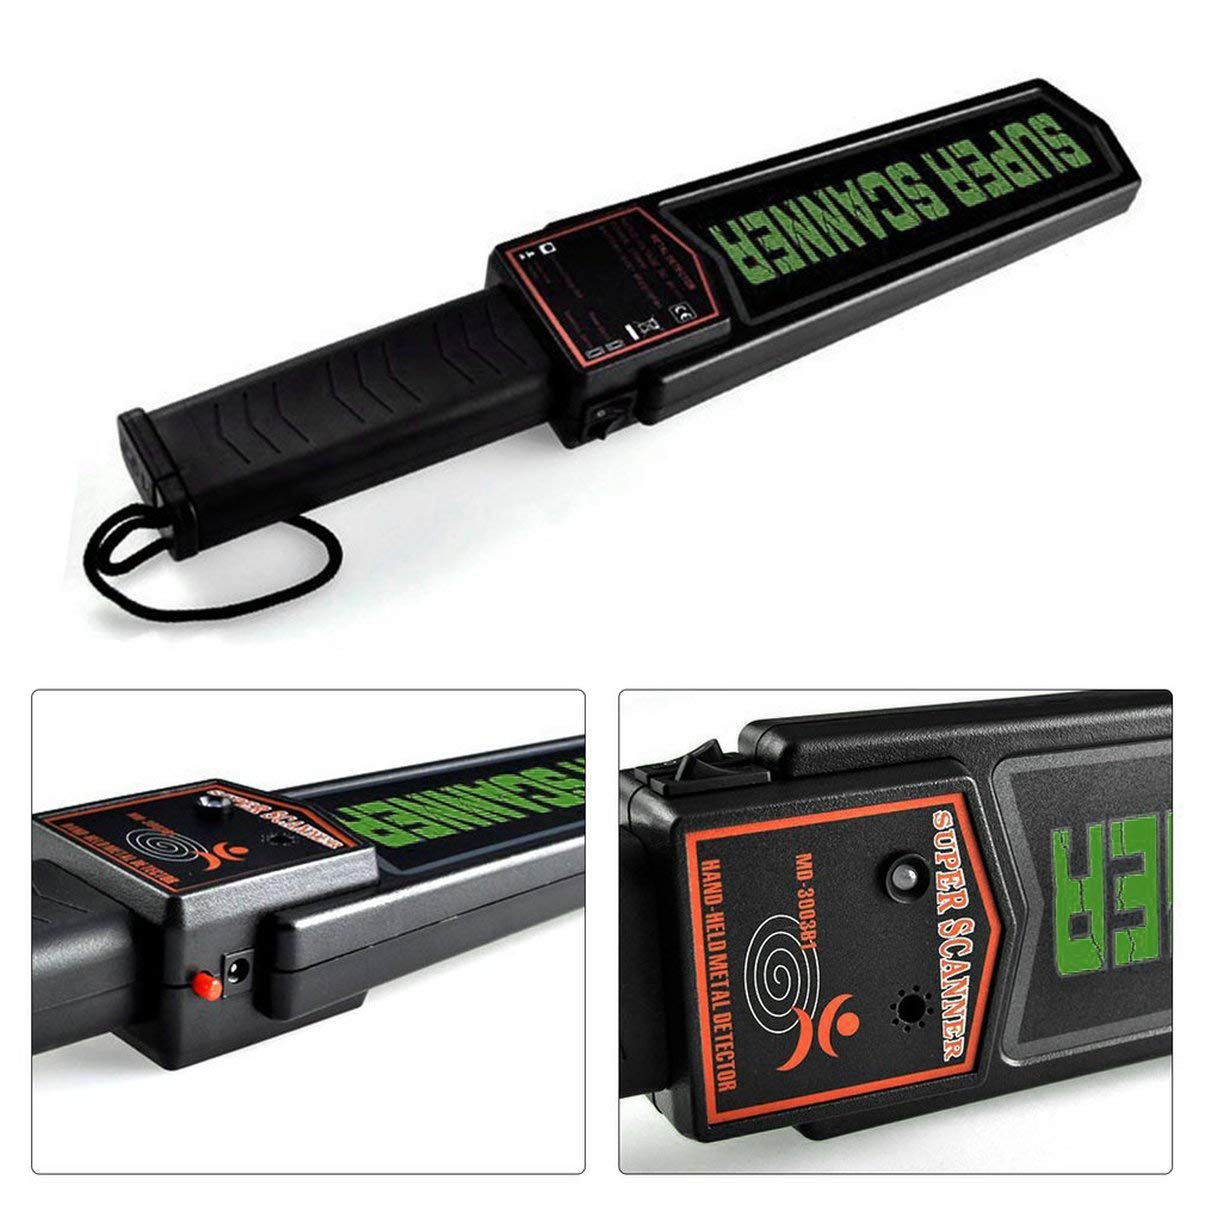 JullyeleDEgant Detector de Metales portátil Seguridad Detector de Metales de Mano Alarma y vibración MD3003B1 Super Scanner Bomb Detector de Metales: ...